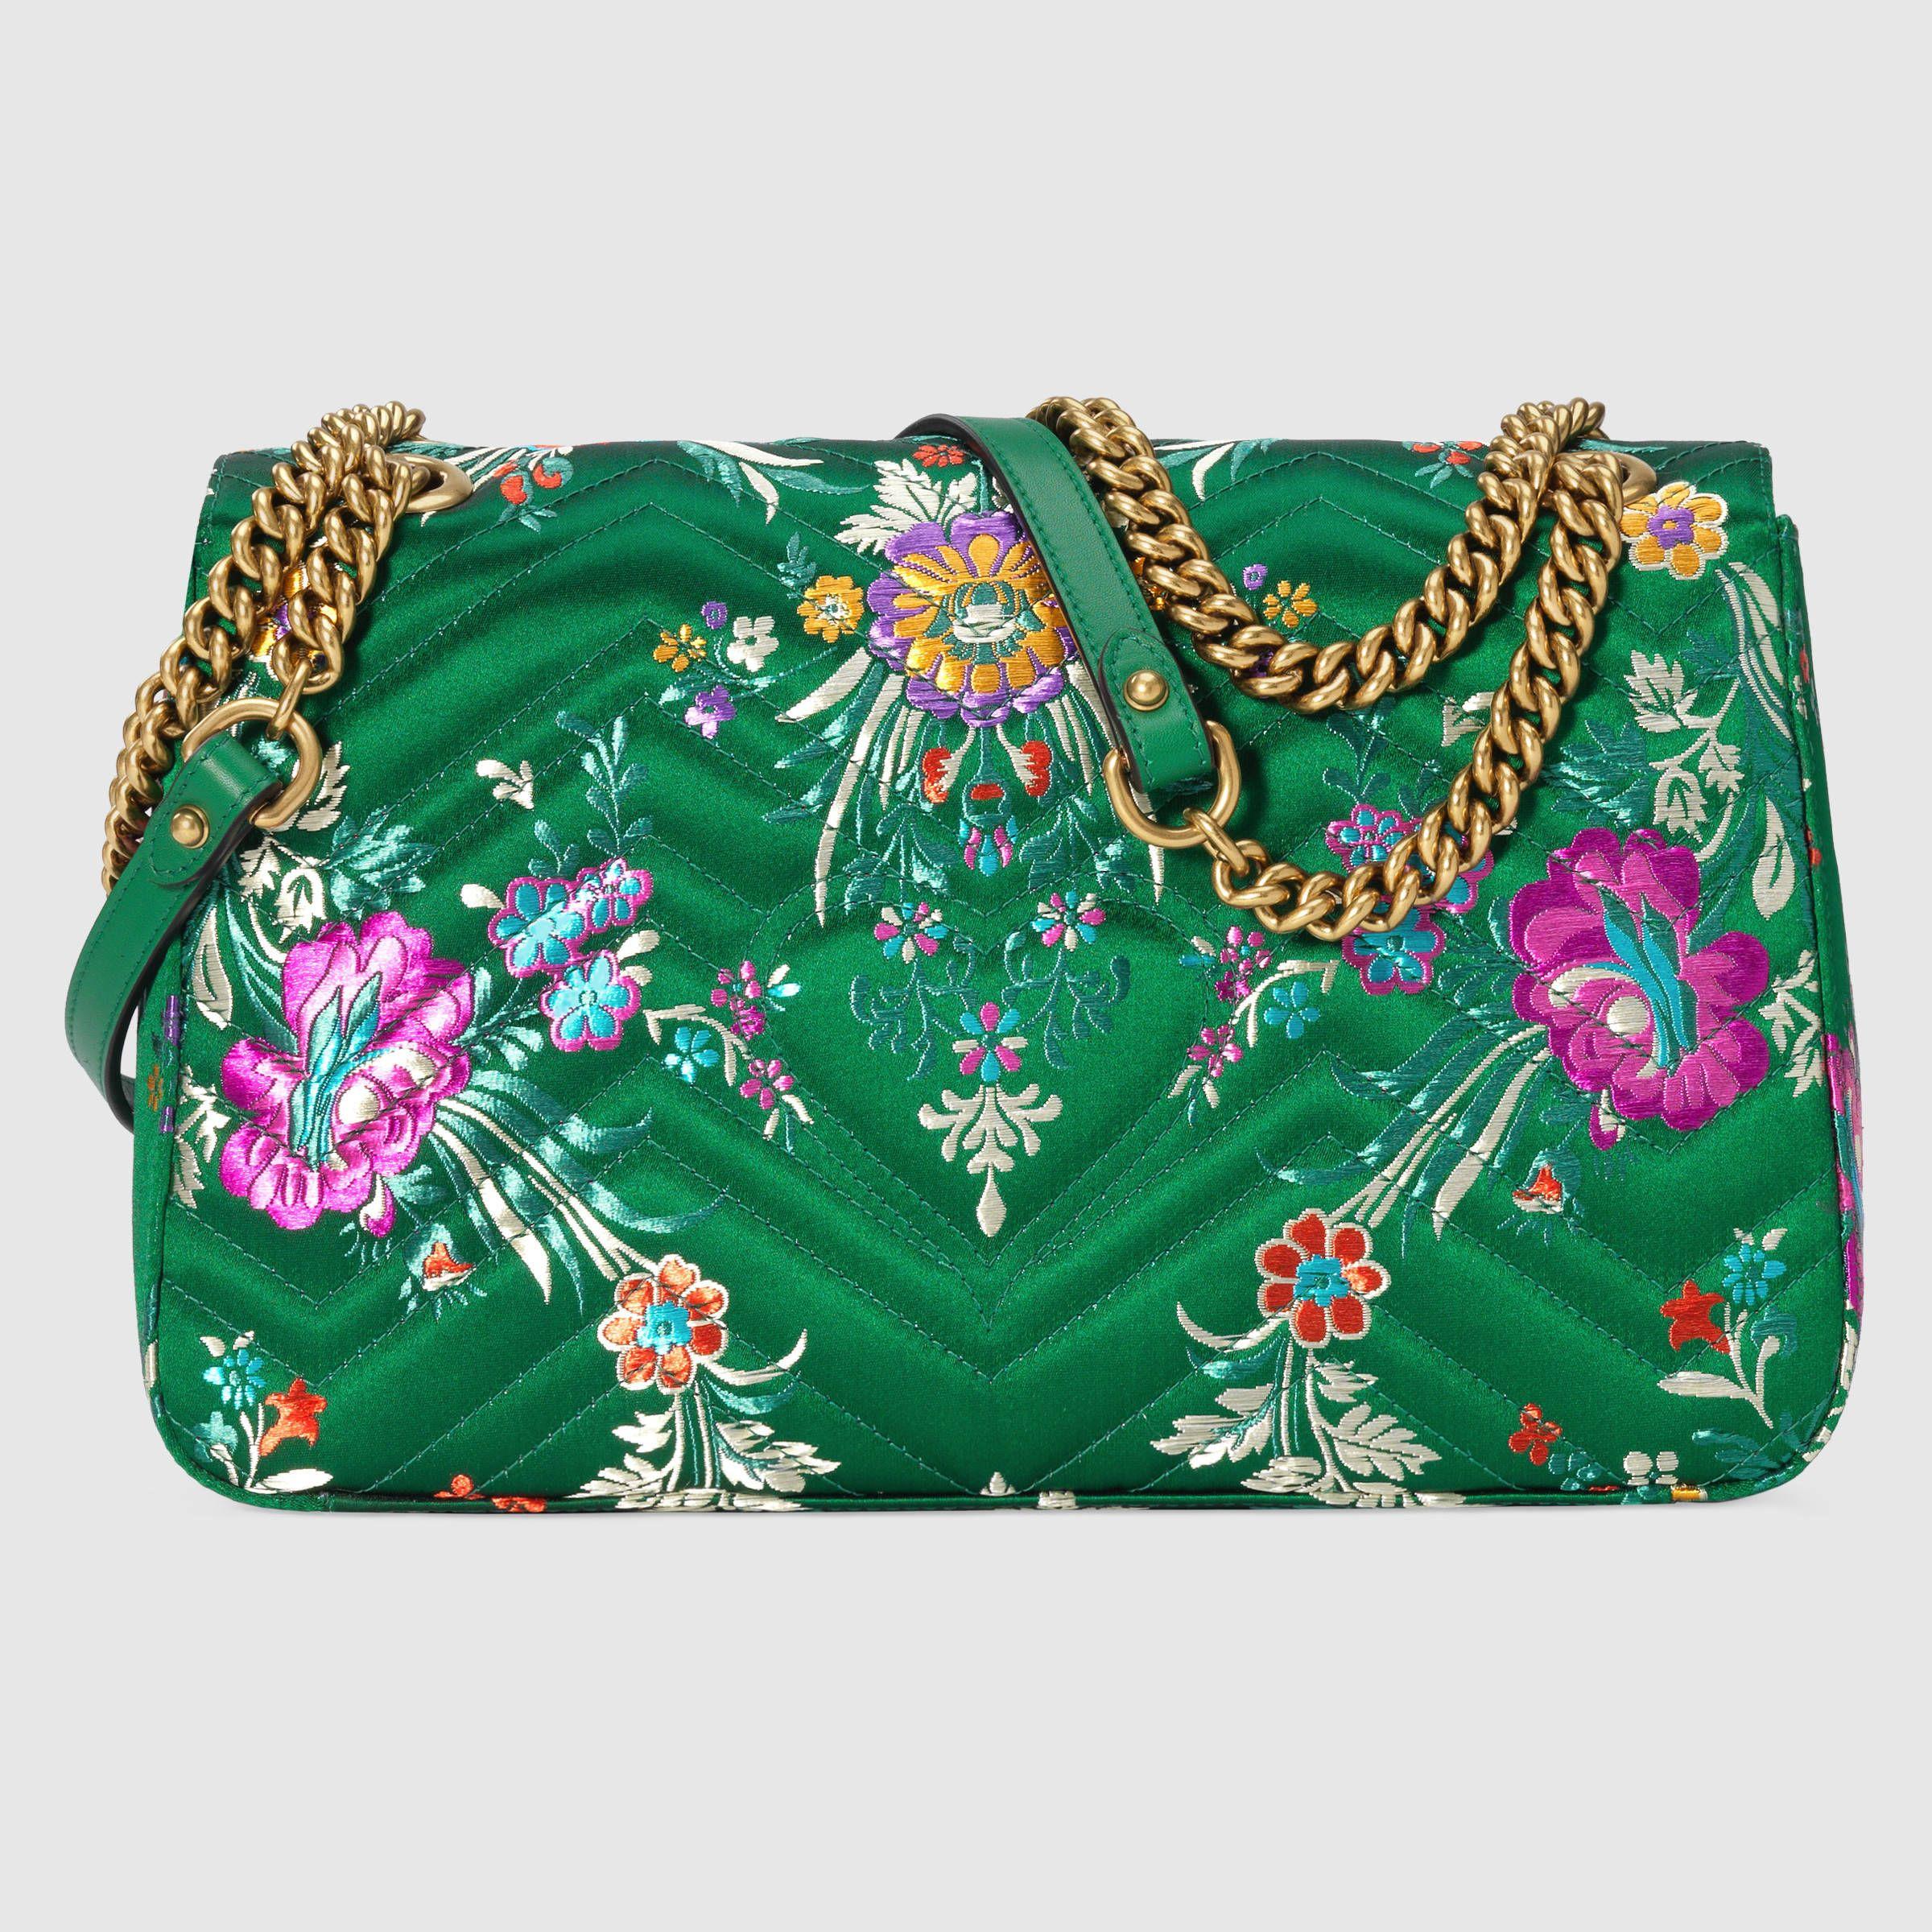 6bd8dd5f47d0 Gucci GG Marmont floral jacquard shoulder bag Detail 3 | Handbags ...